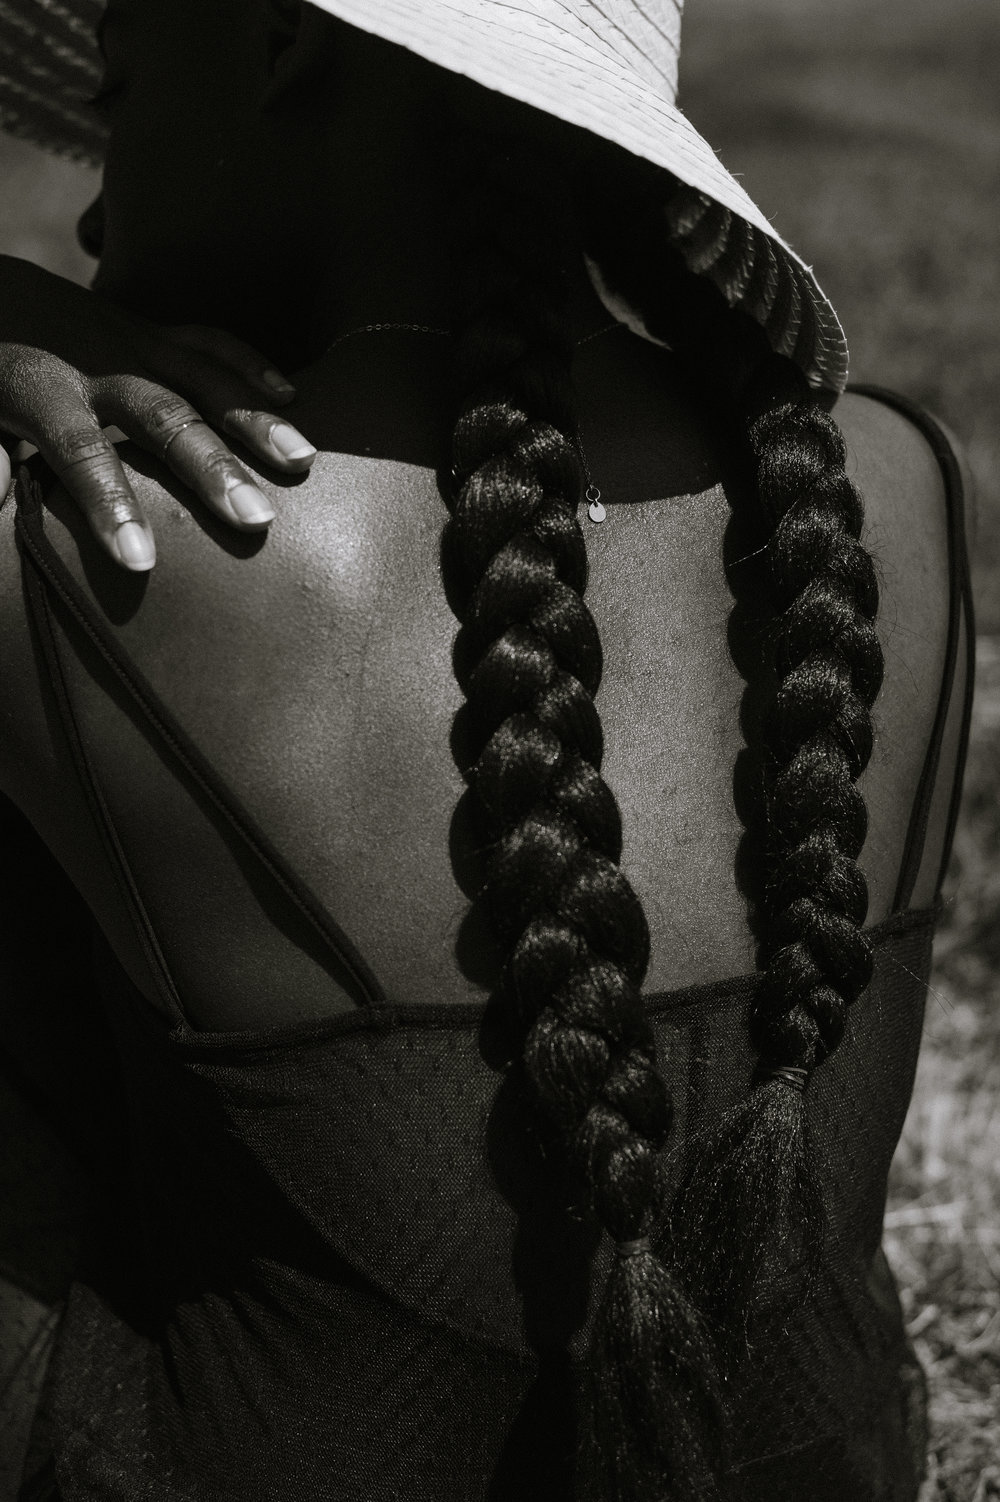 Tasha-James-The-Glossier-Blogger-Fashion-Style-HM-Lace-Dress-Black-23.jpg